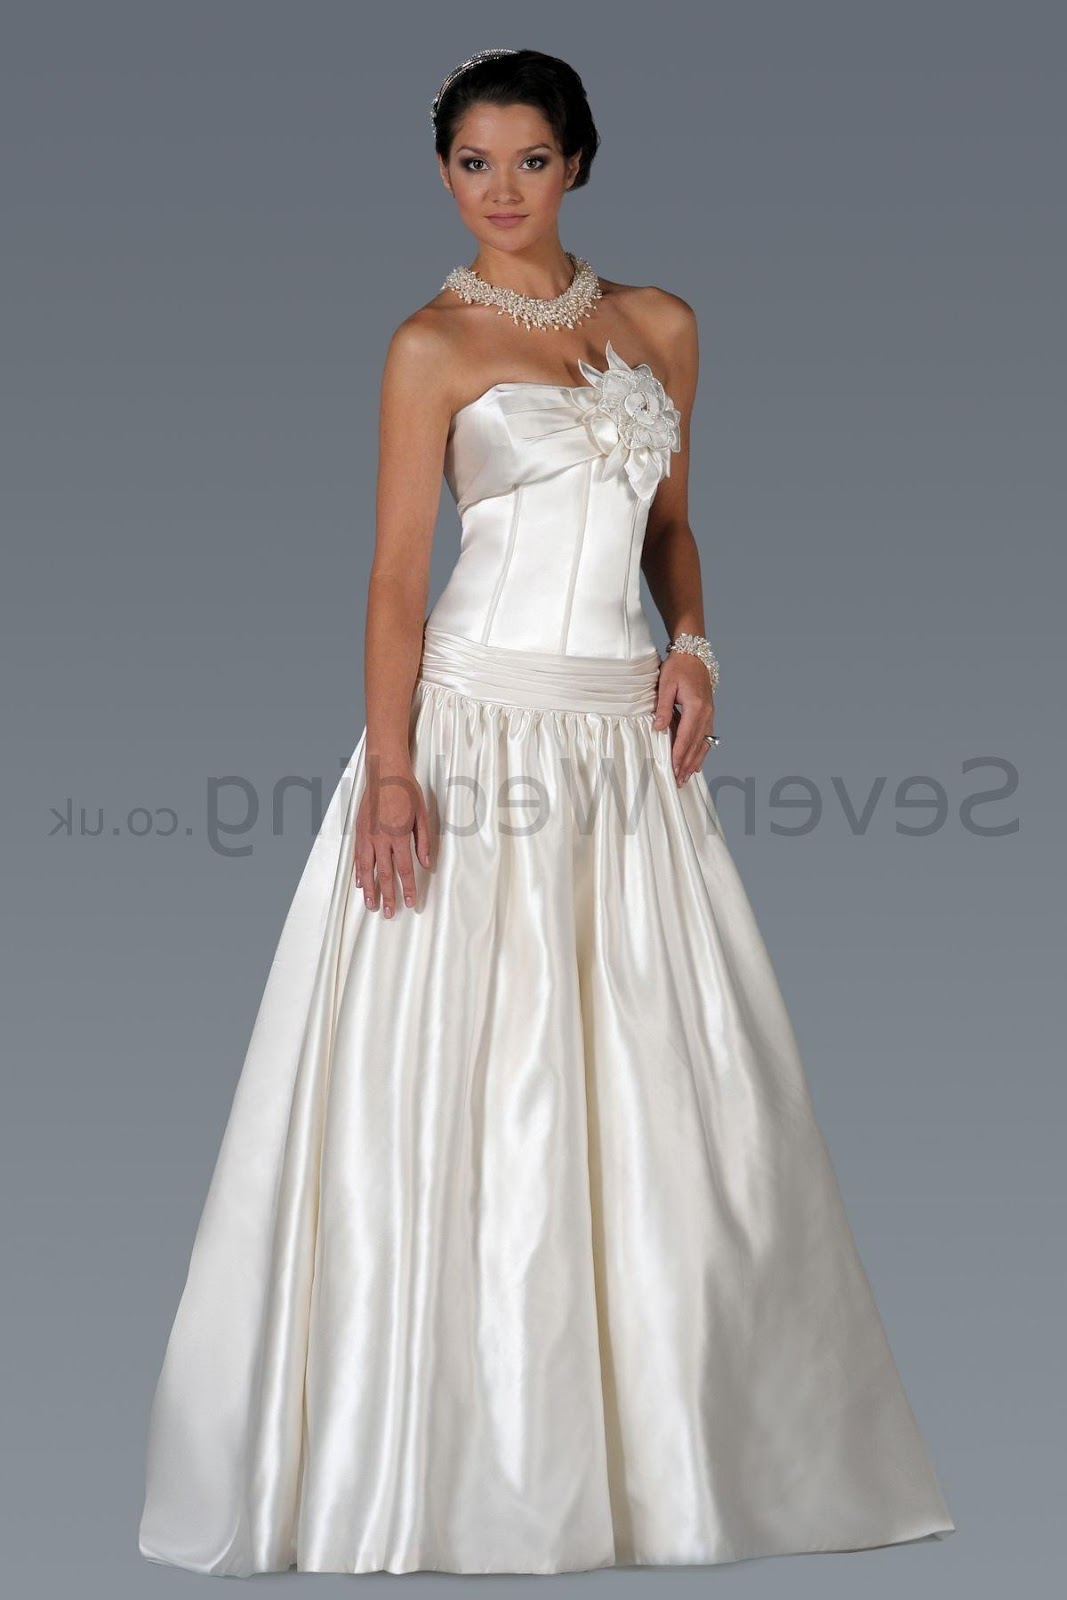 Satin Ball Gown Sweetheart